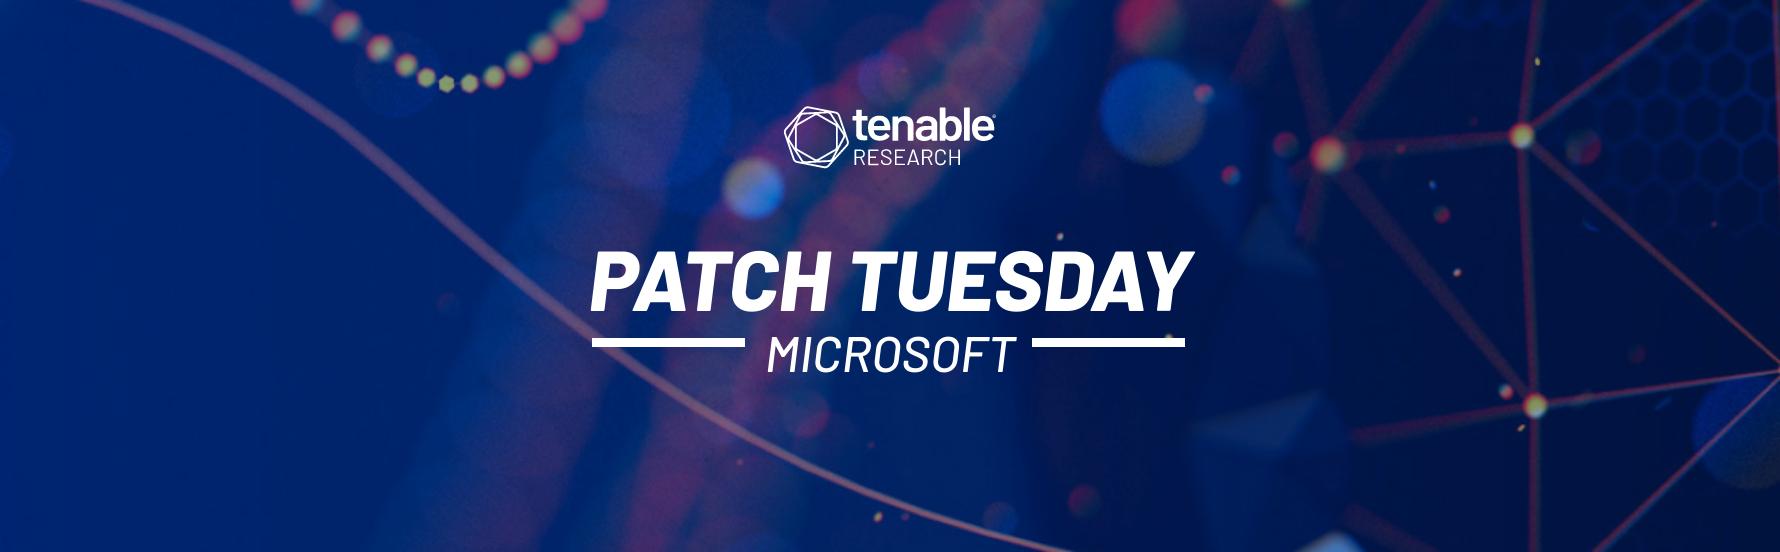 Microsoft's July 2021 Patch Tuesday Includes 116 CVEs (CVE-2021-31979, CVE-2021-33771)